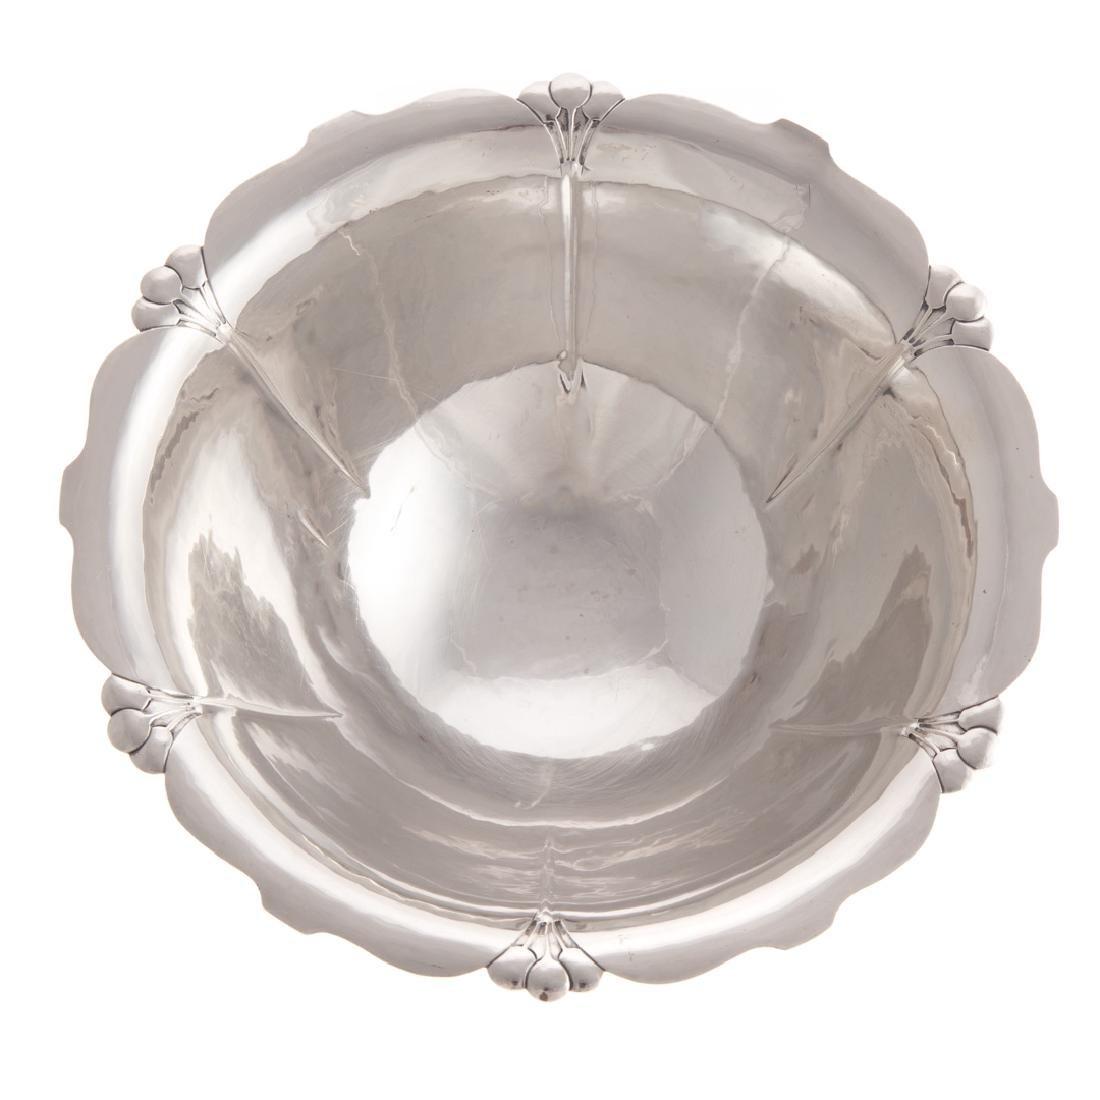 Georg Jensen style hammered sterling center bowl - 2